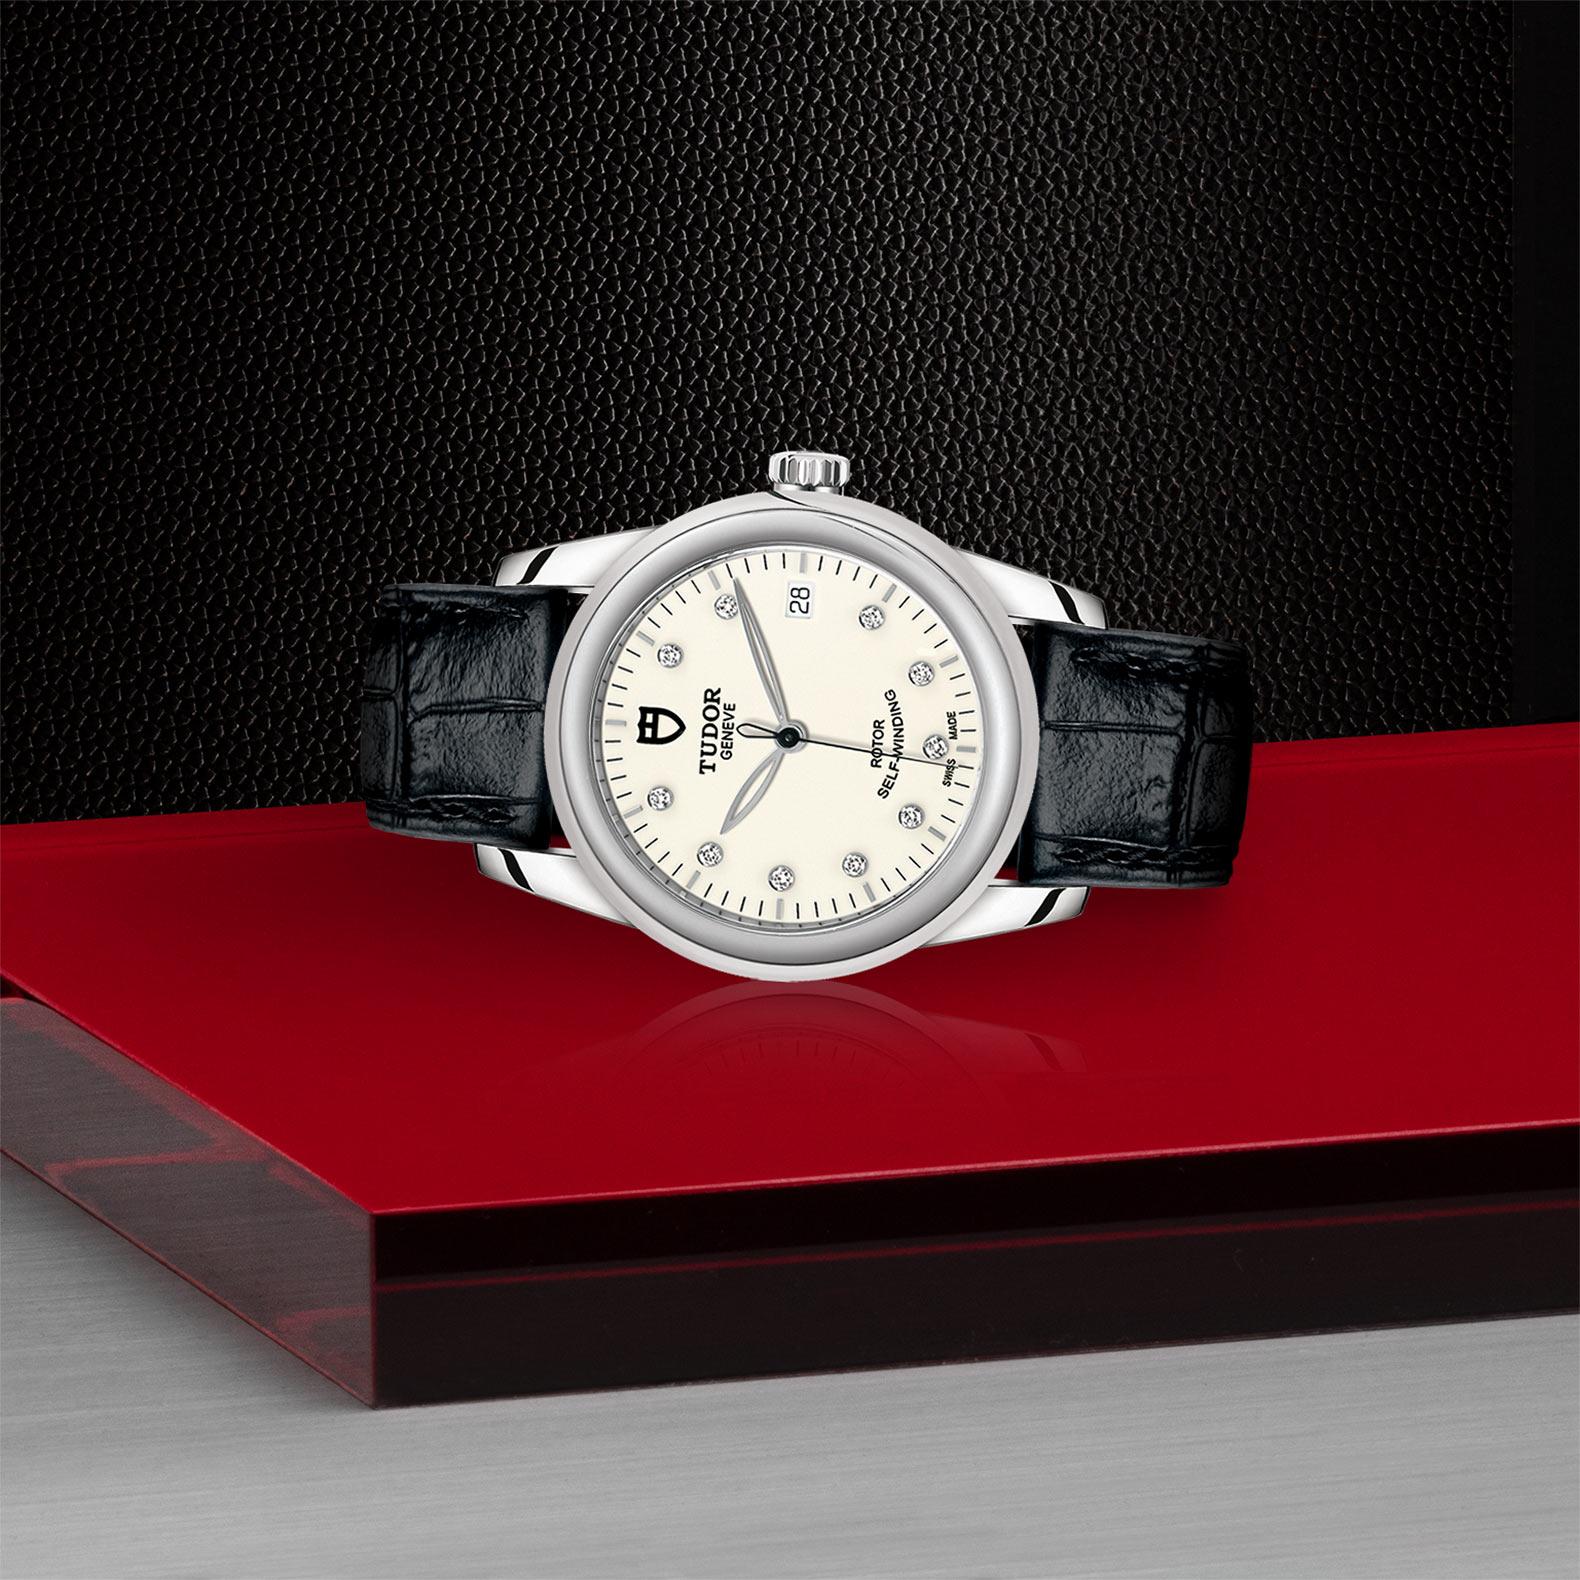 TUDOR Glamour Date - M55000-0116